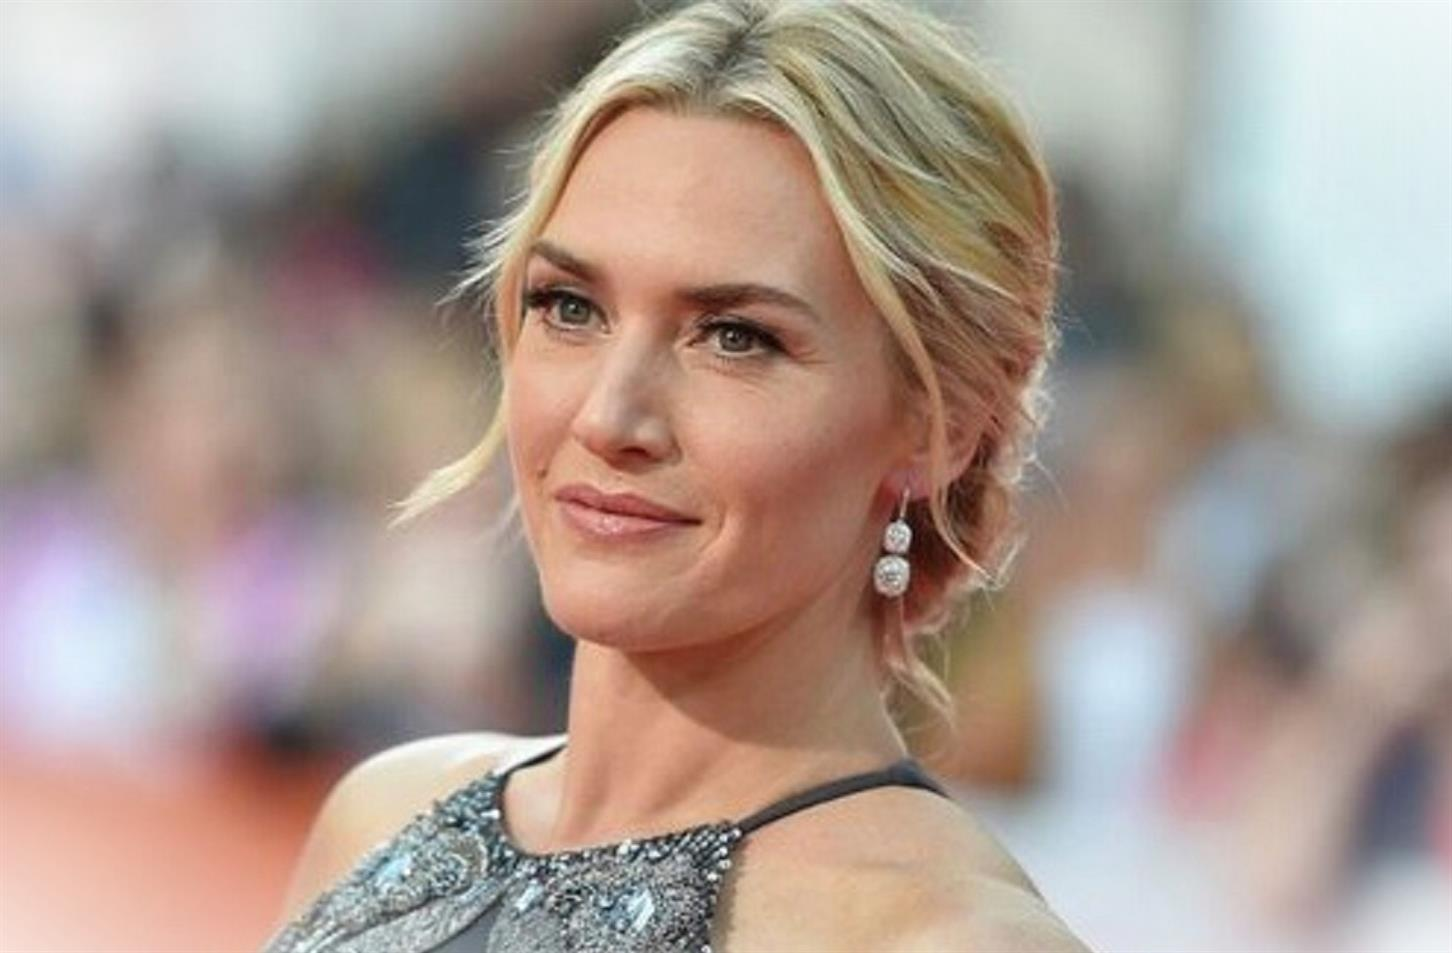 No Kate Winslet non si preoccupa di Affleck J Lo ReunionUtF8EgEaJ 1